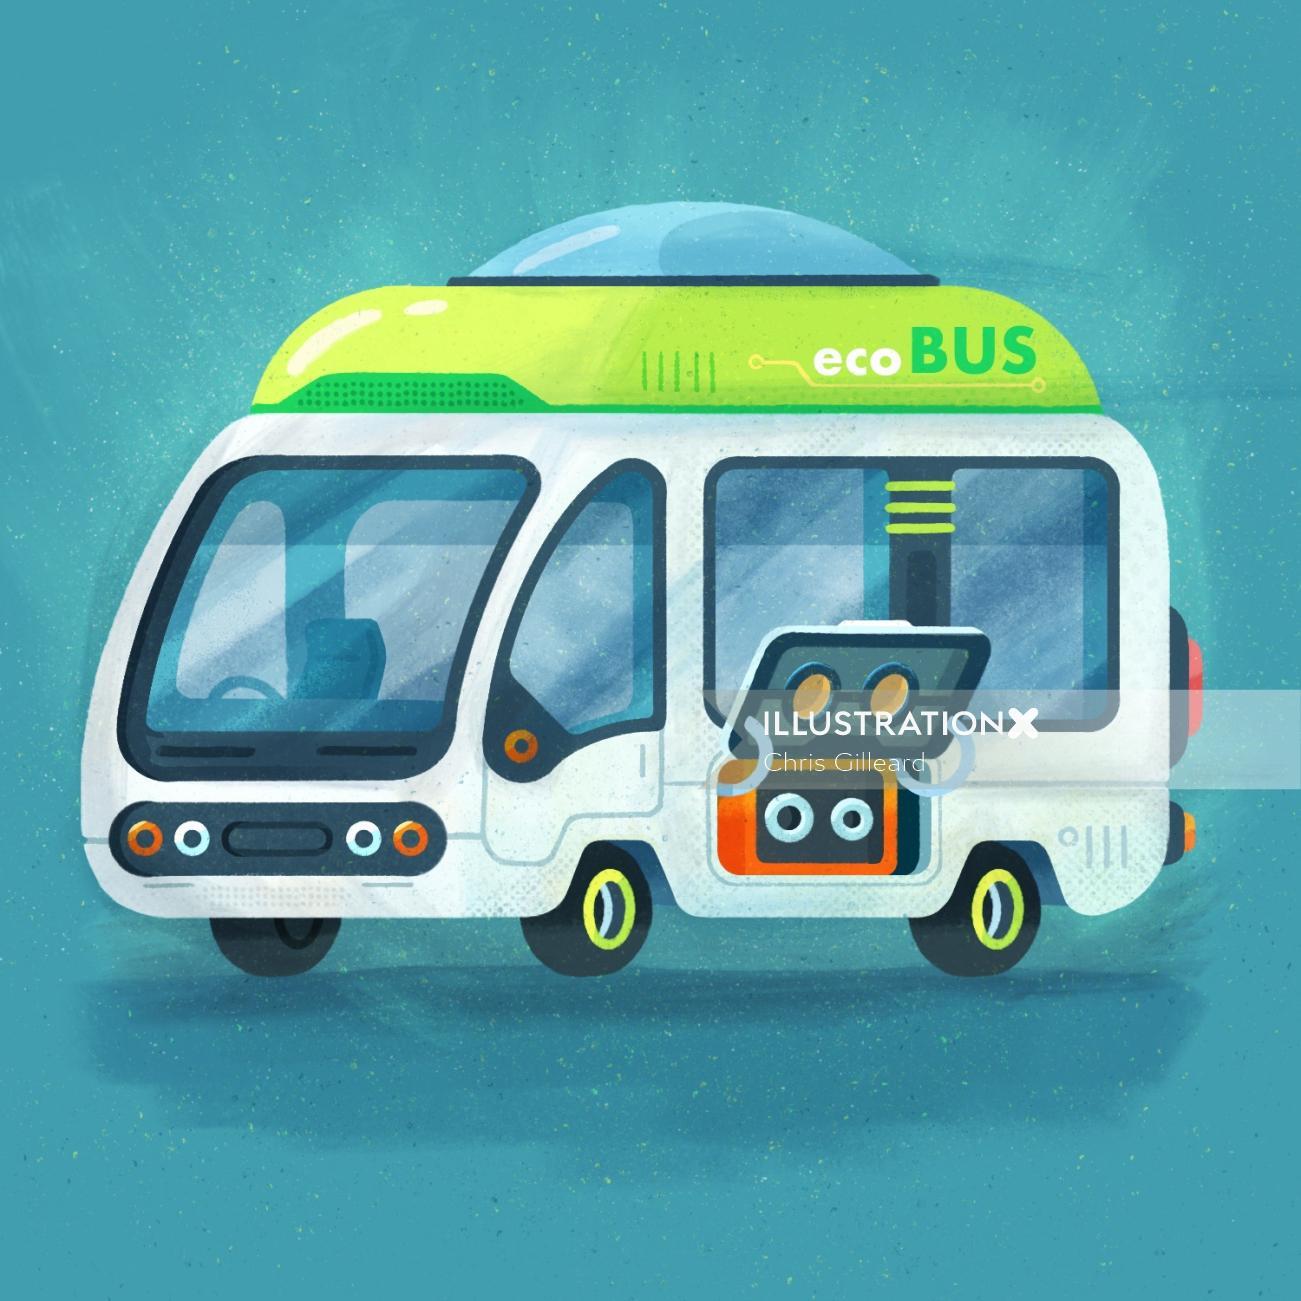 conceptual illustration of Eco bus